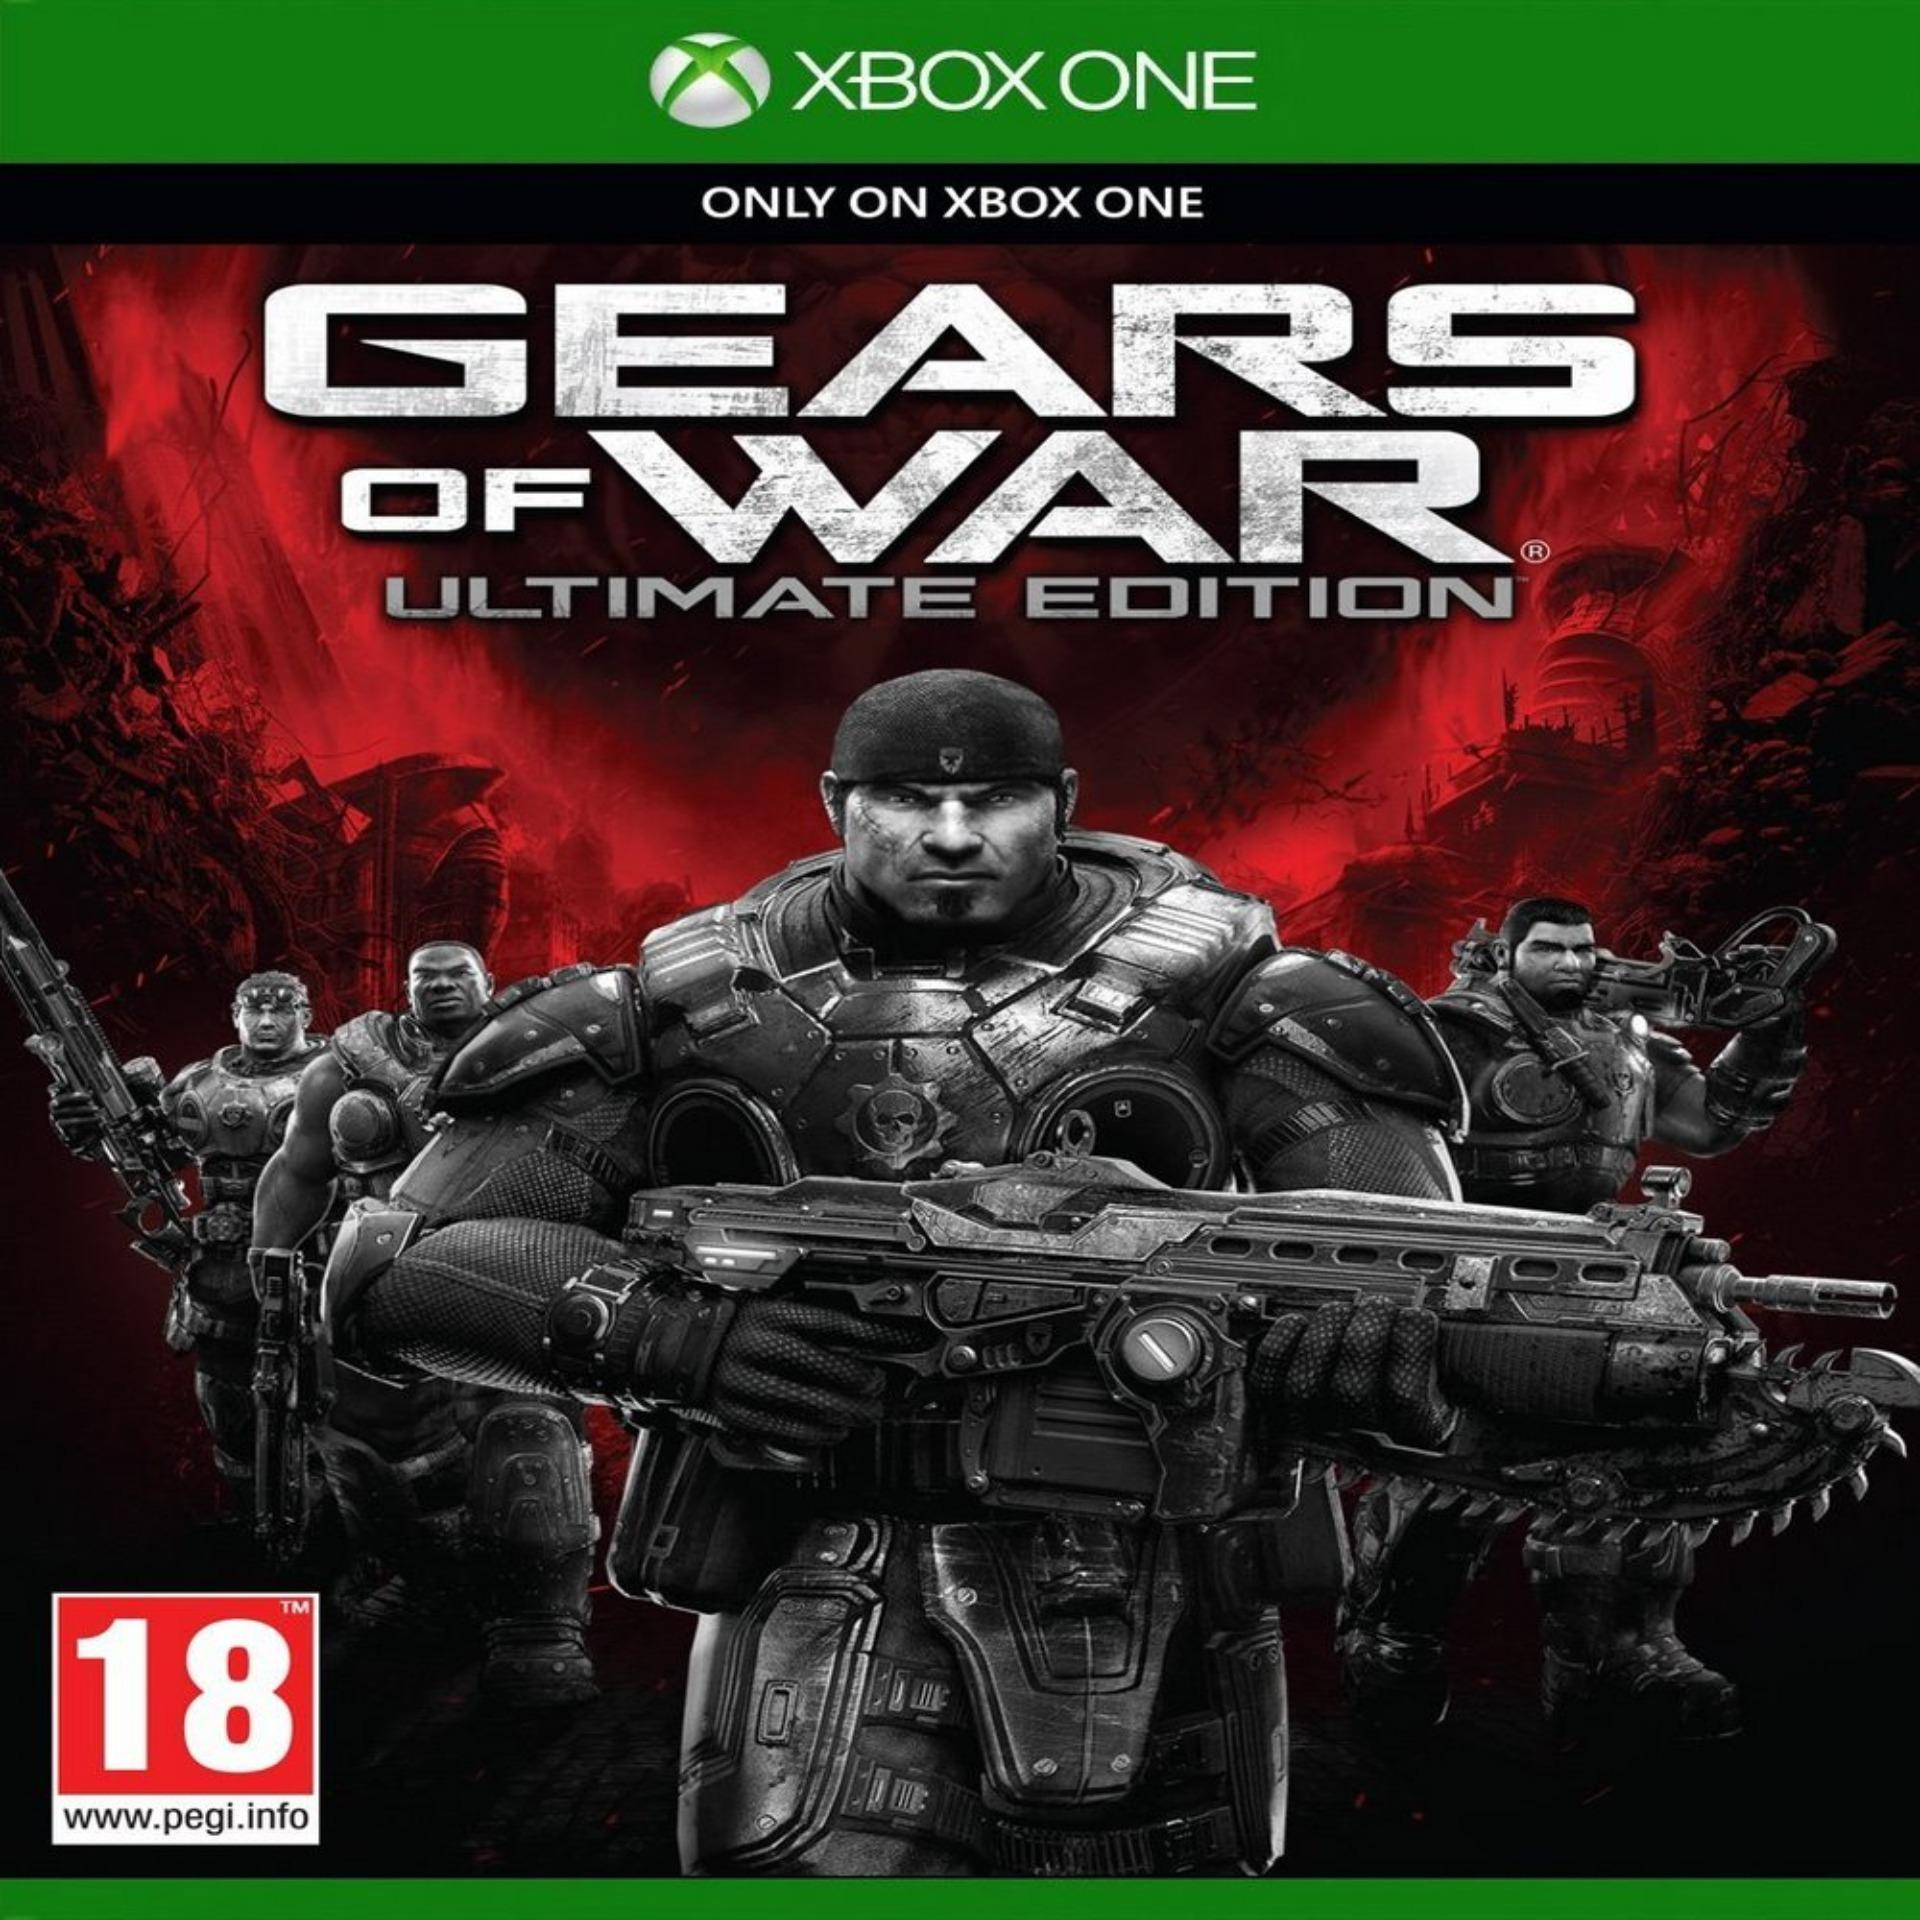 Bảng Giá Đĩa Game Xbox One – Gears of War Ultimate Edition